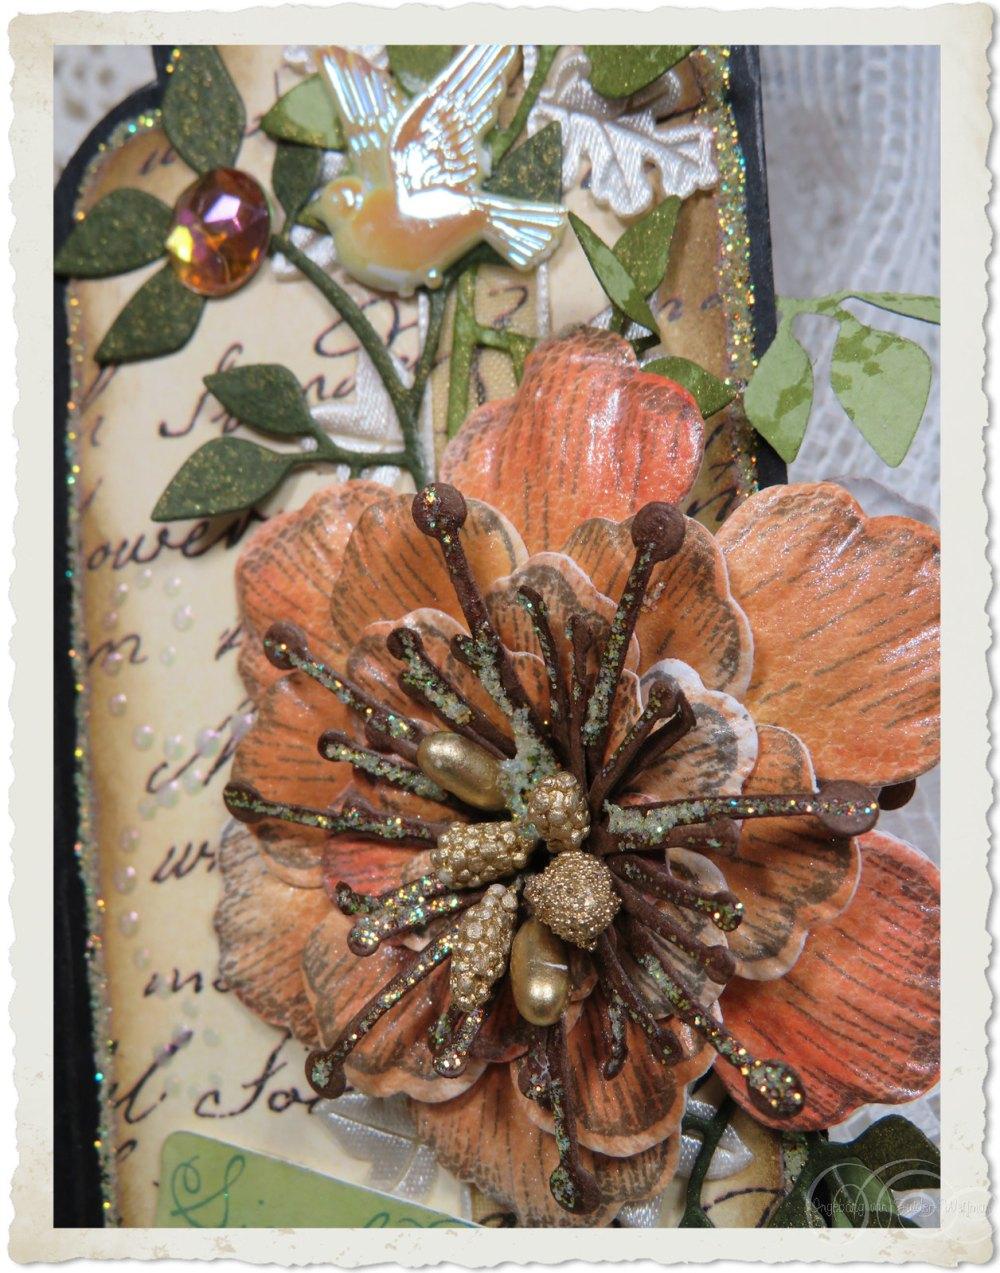 Arianna blooms by Ingeborg van Zuiden